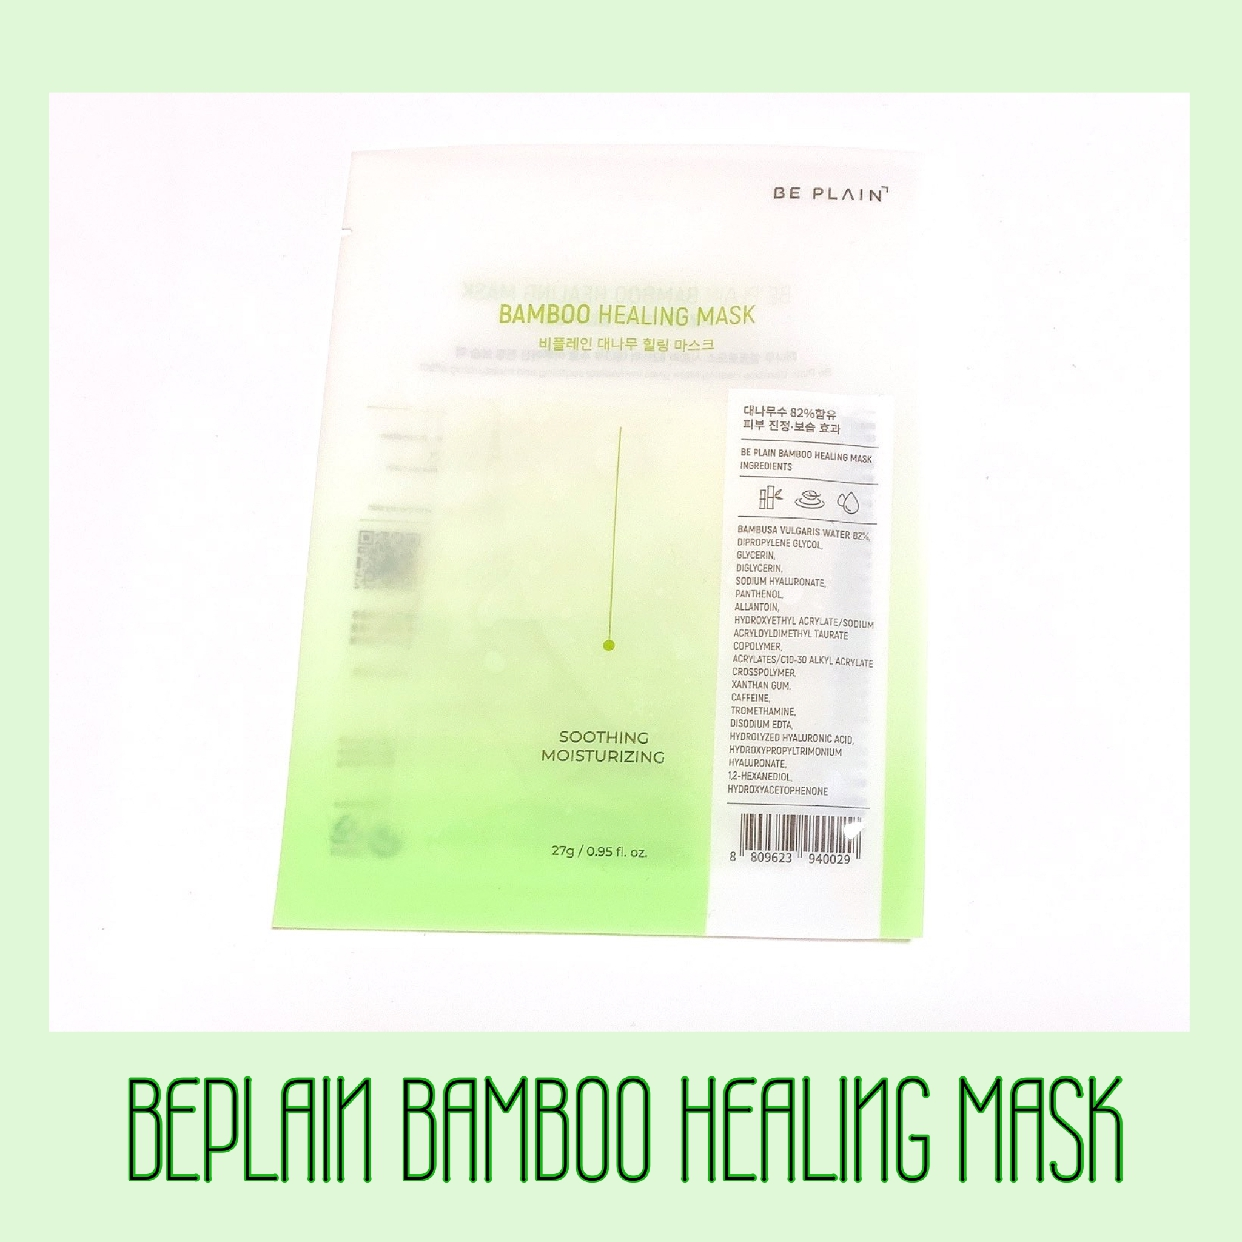 beplain(ビープレーン)BAMBOO HEALING MASKを使った             葵さんのクチコミ画像1